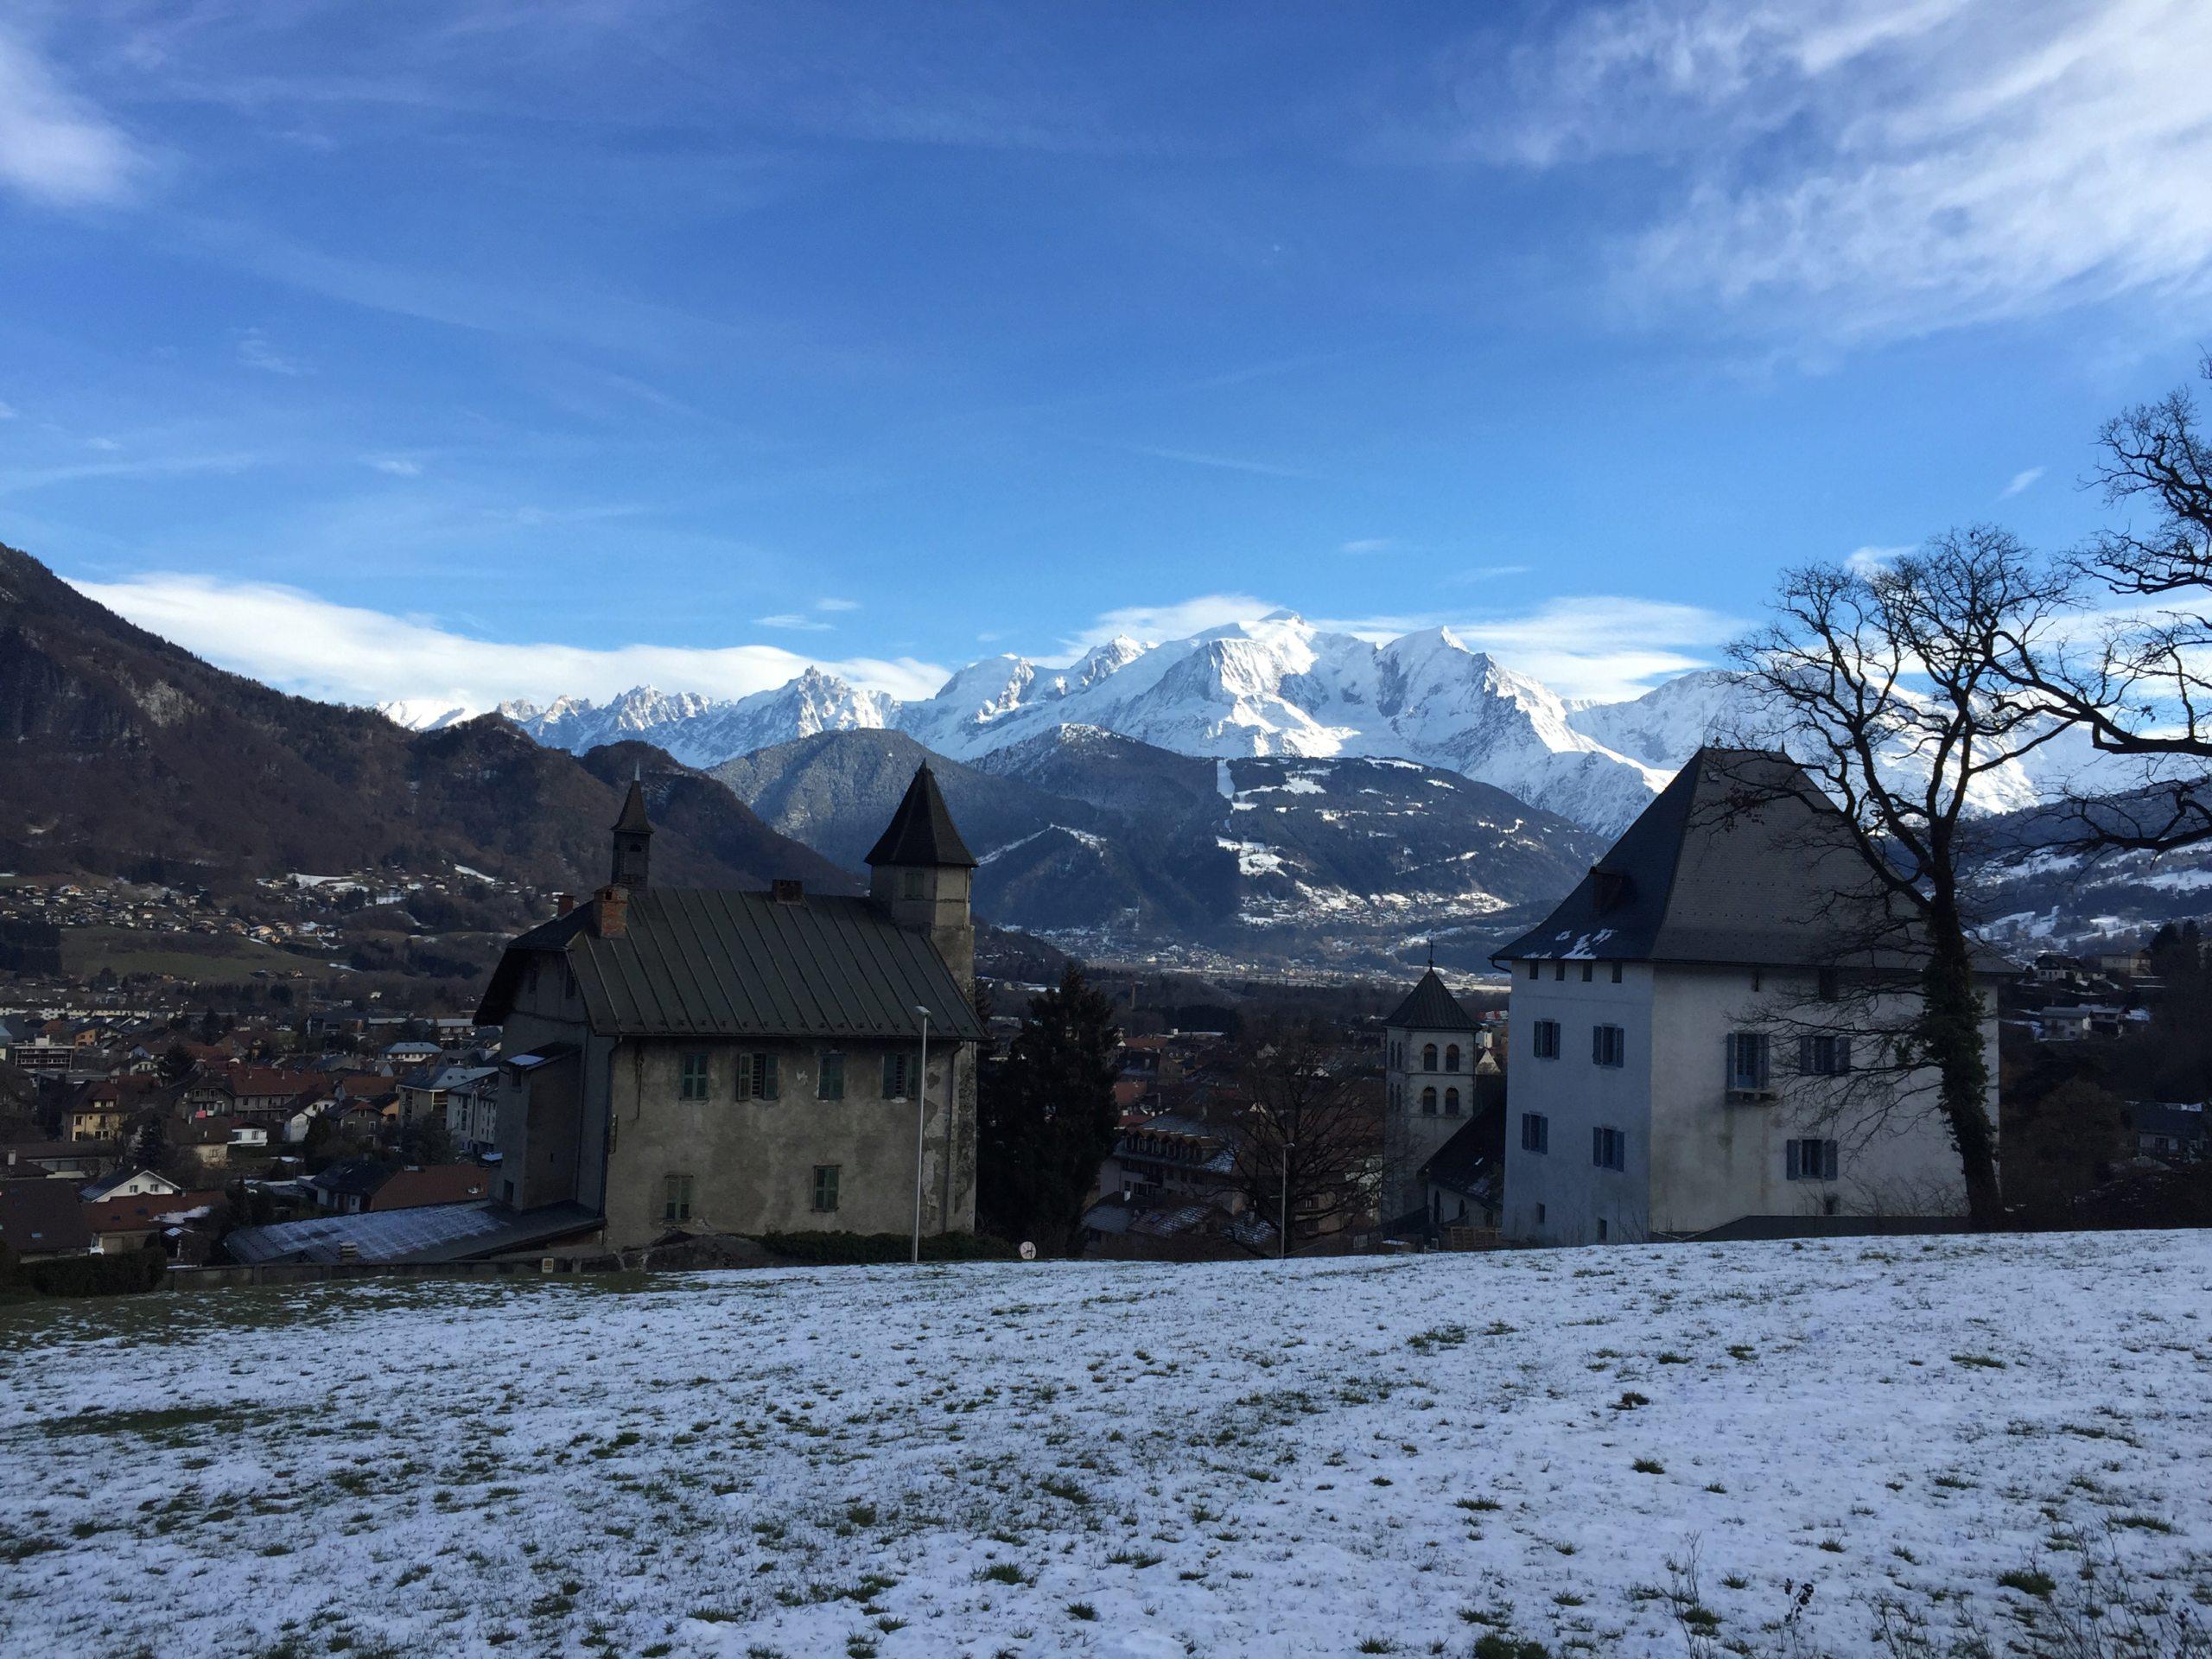 Petites balades en Rhône-Alpes - Page 2 Img_8512